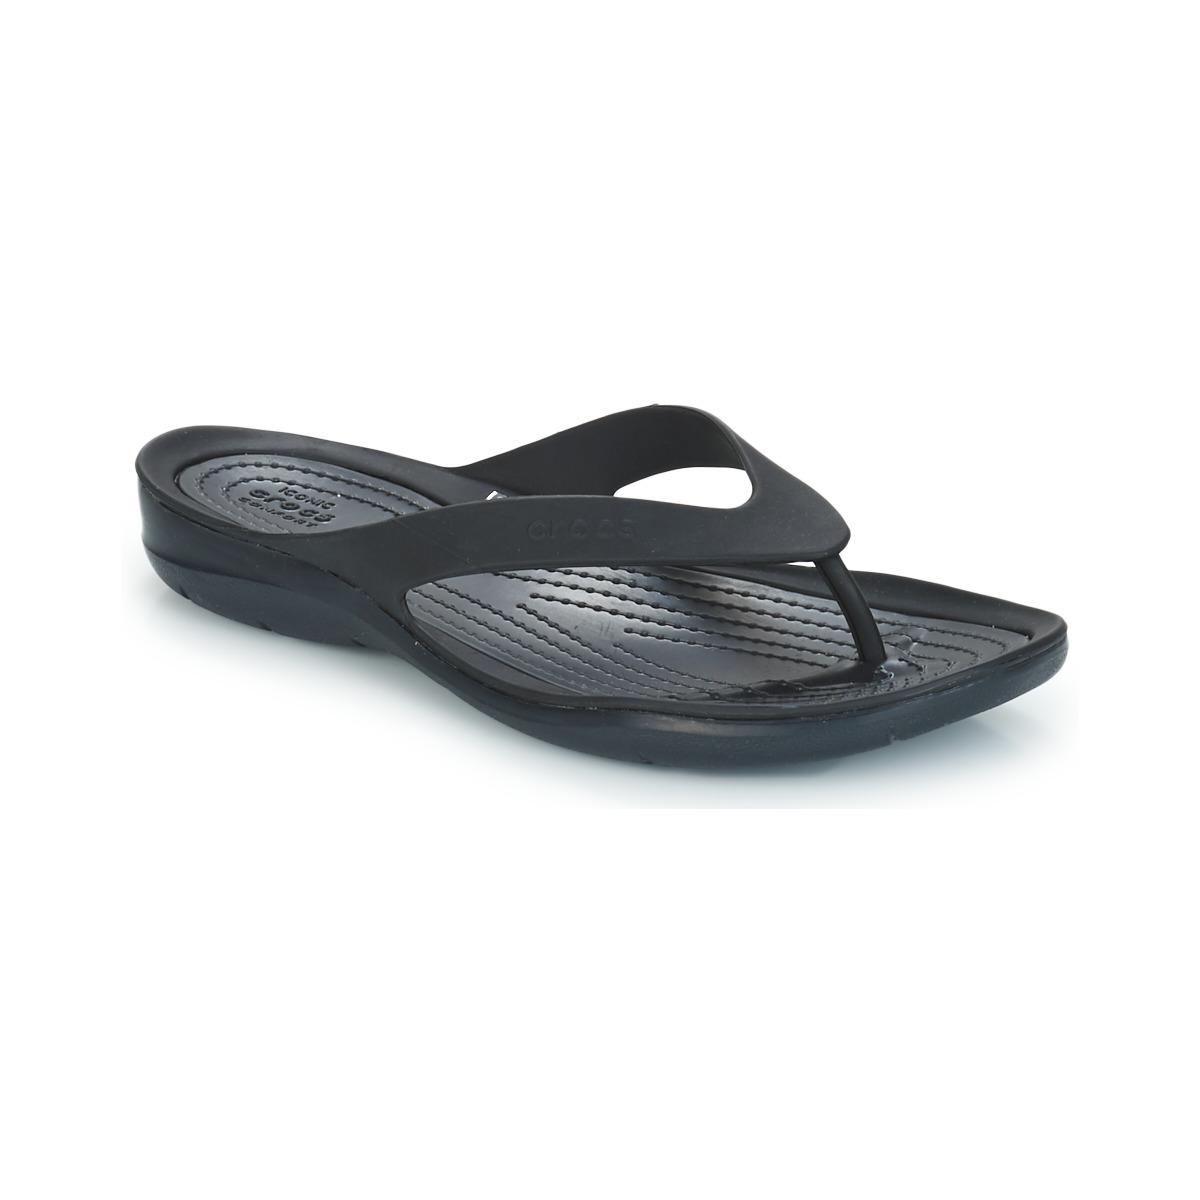 ... Crocs Žabky SWIFTWATER FLIP W Crocs. -5% Nové ... 8603aae5e7